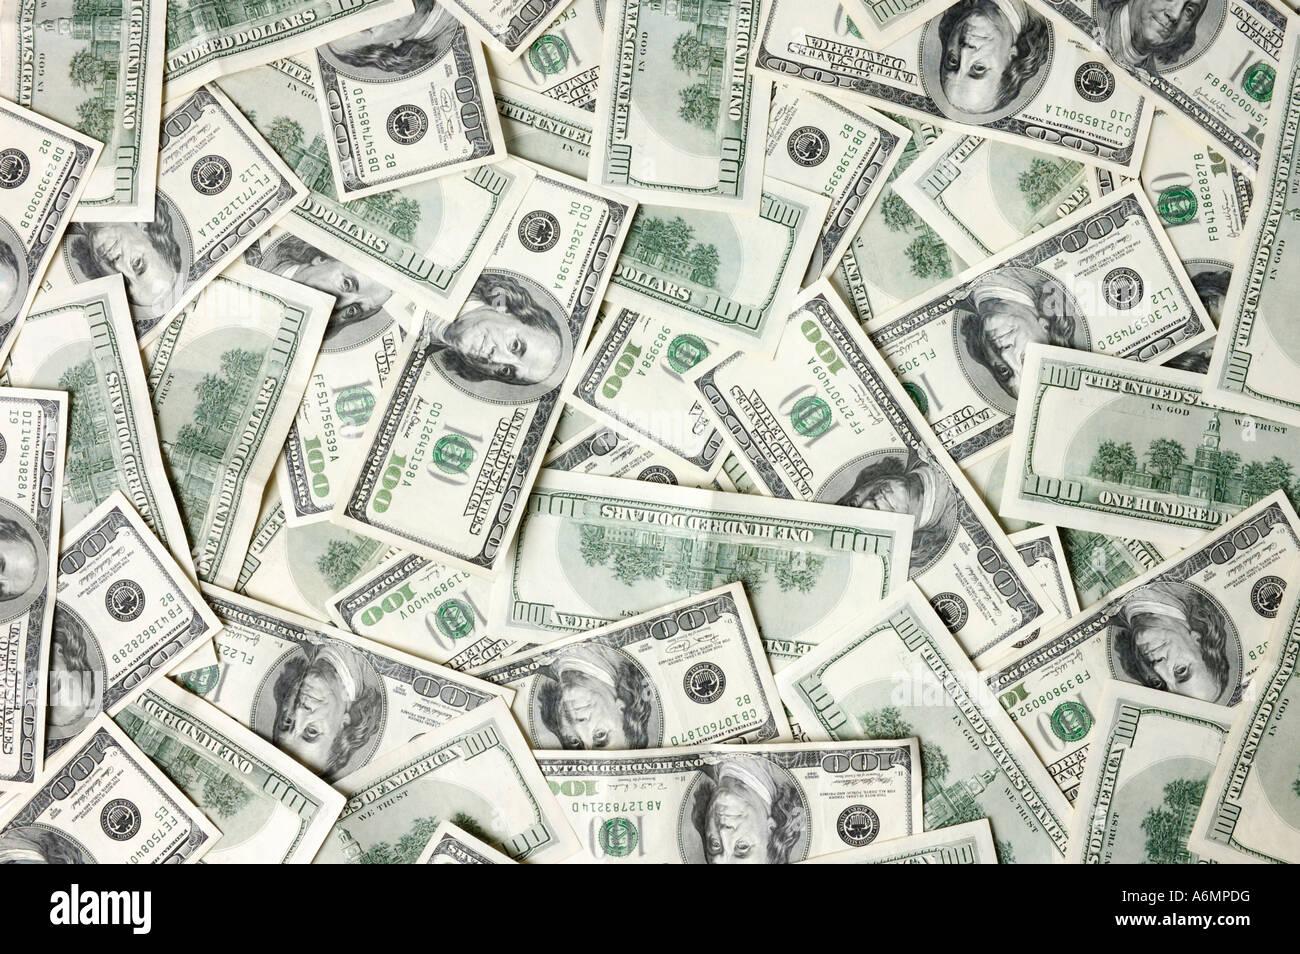 Billetes de cien dólares textura de fondo Imagen De Stock